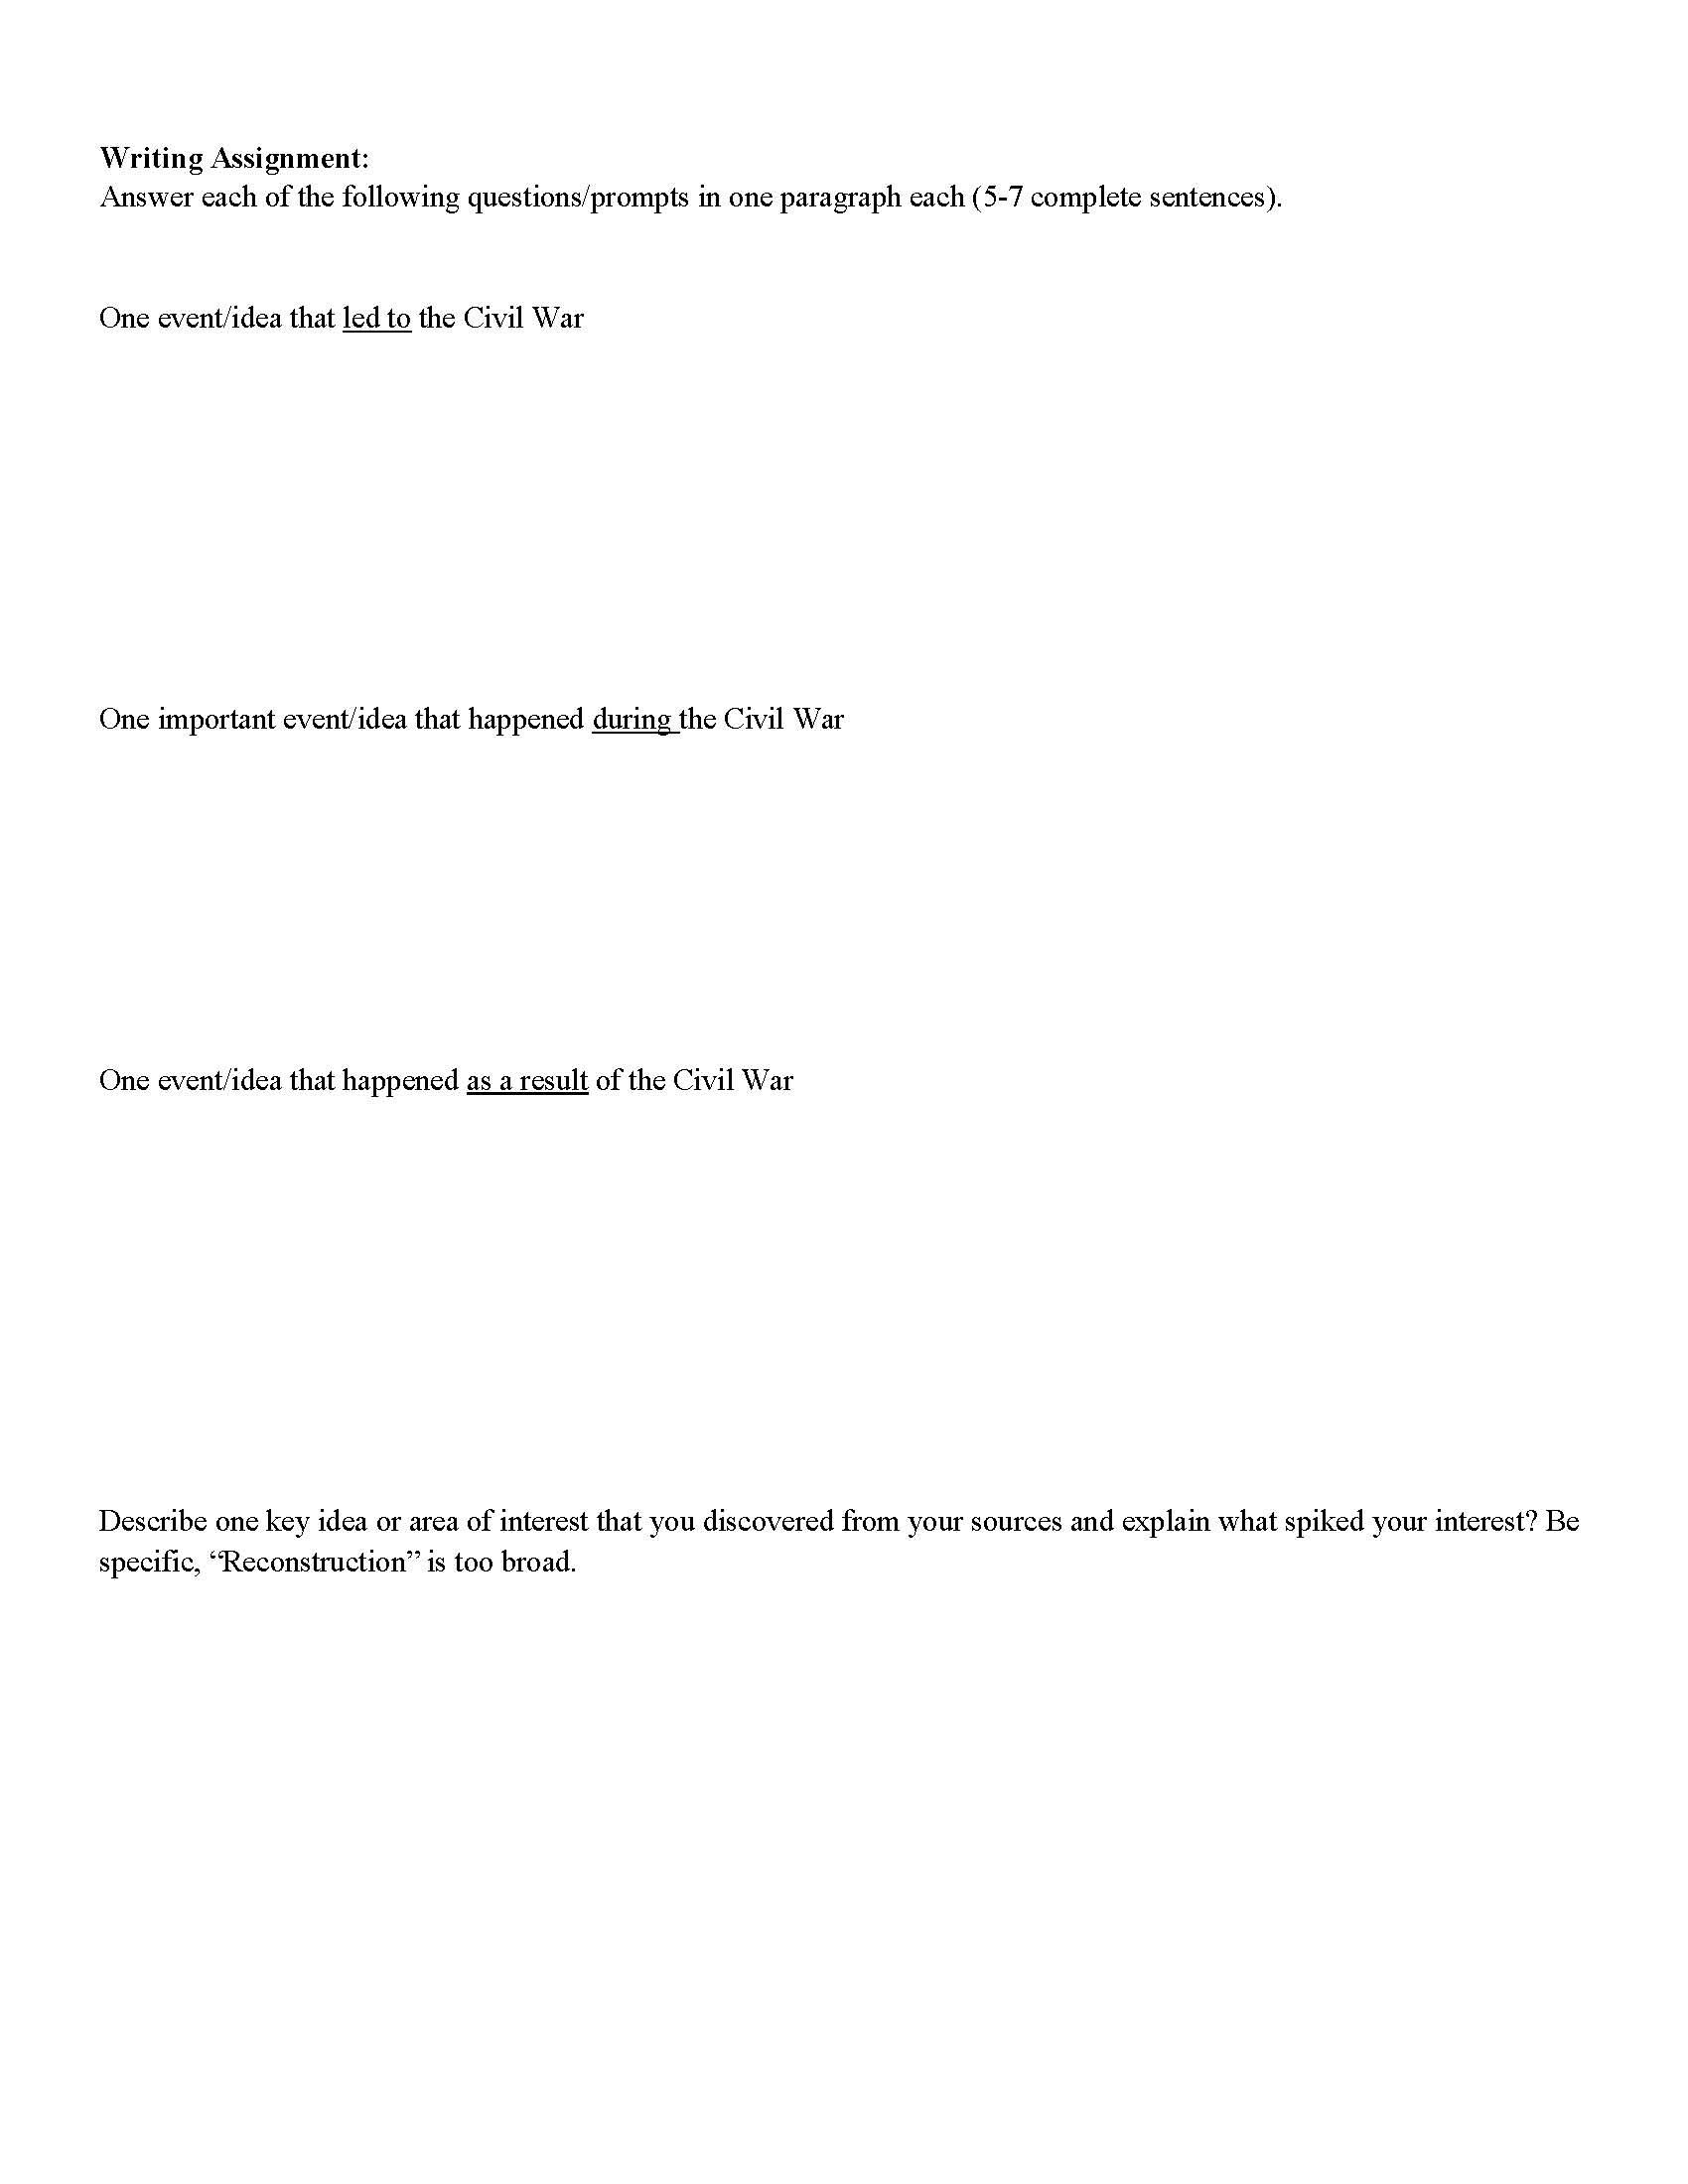 pestle analysis essay mcdonalds uk